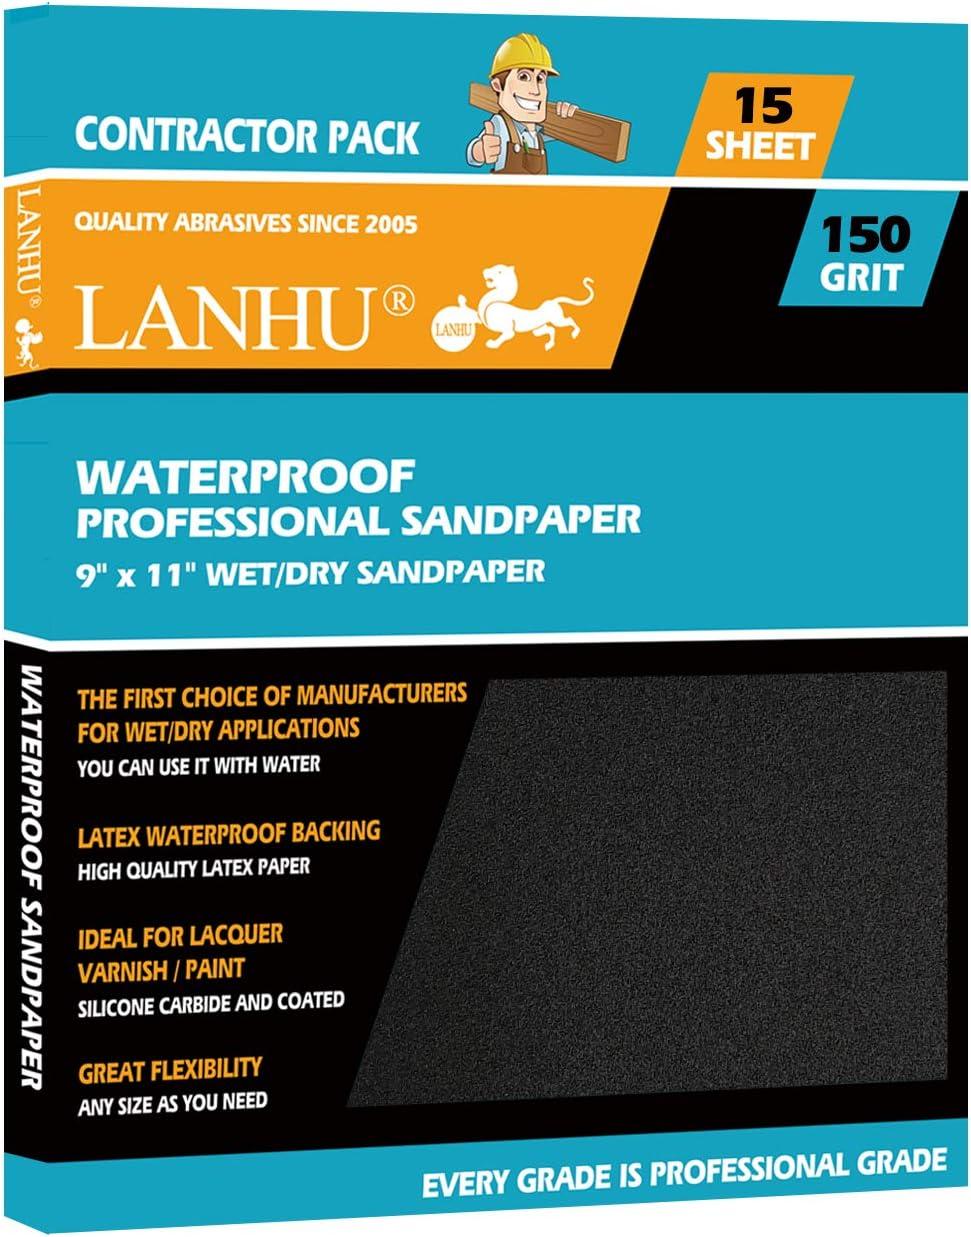 LANHU 150 Grit Sandpaper for Wood Furniture Finishing, Metal Sanding and Automotive Polishing, Dry or Wet Sanding, Multipurpose Sandpaper, 9 x 11 Inches, 15-Sheets